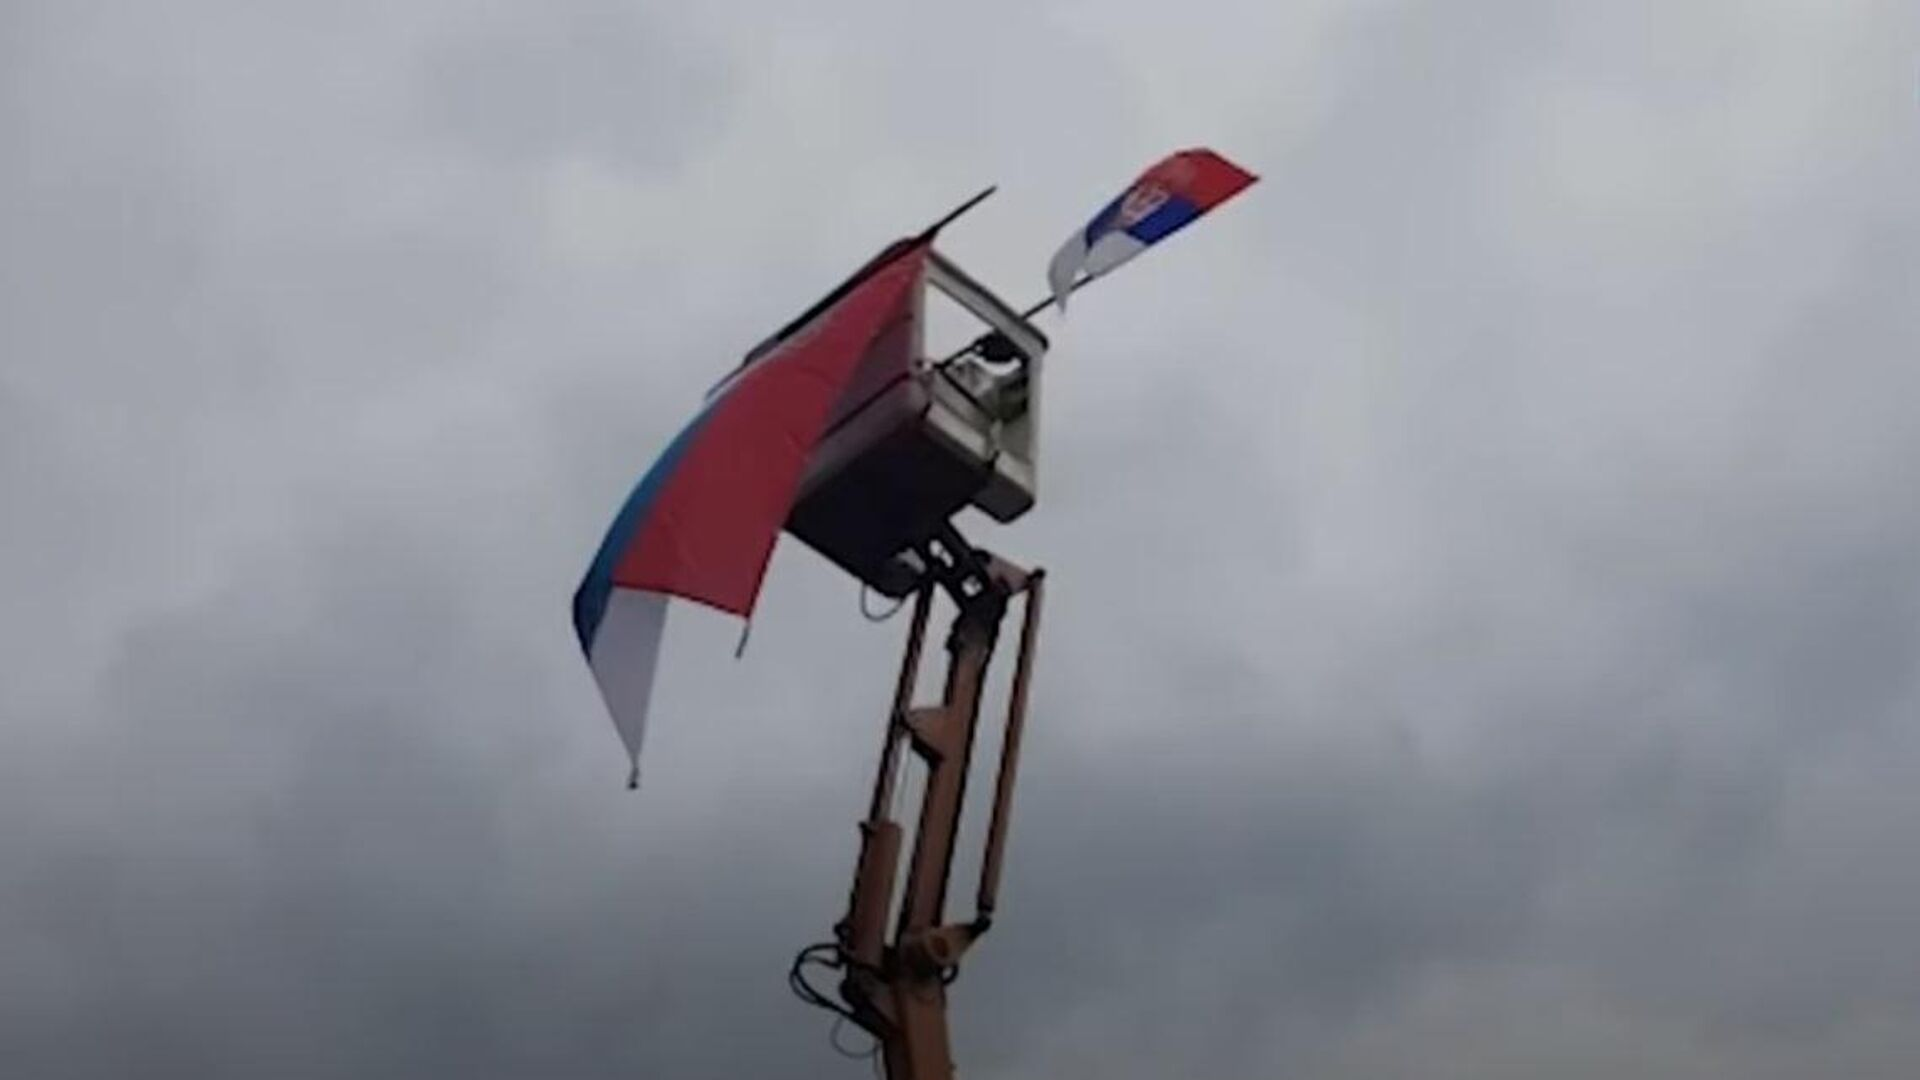 Српска застава се вијори на Јарињу - Sputnik Србија, 1920, 22.09.2021